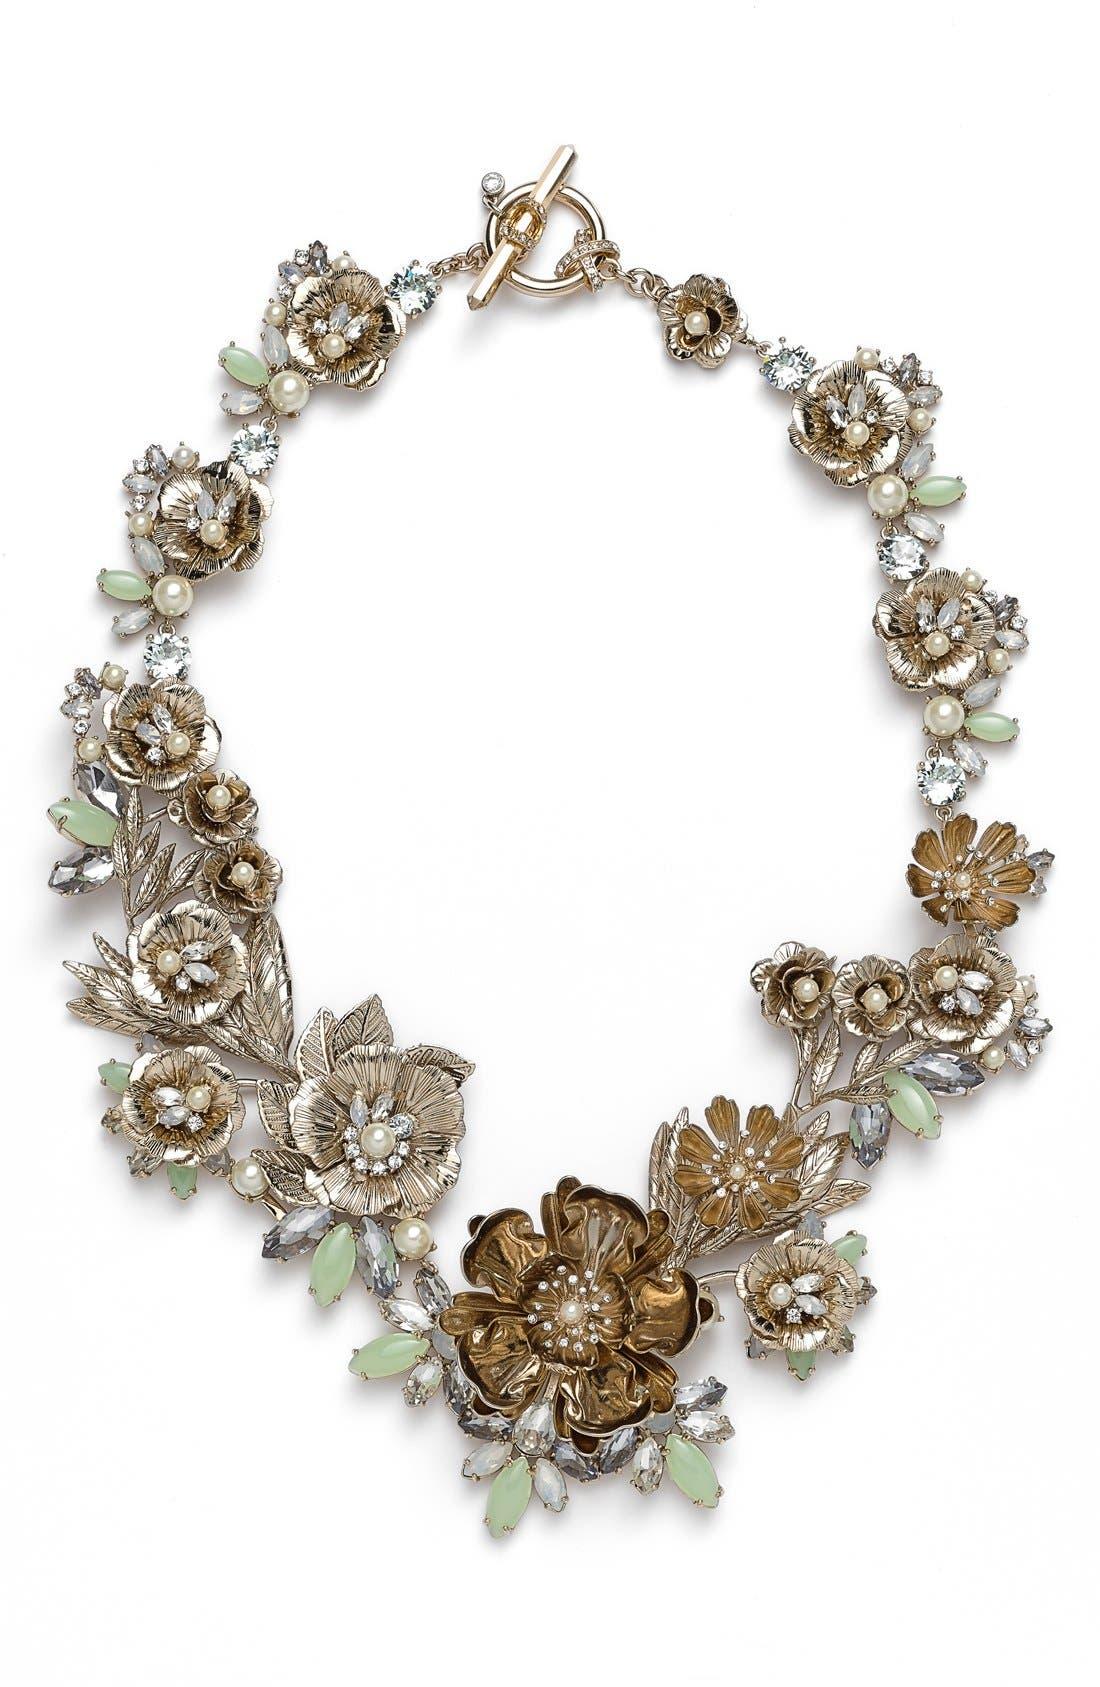 Main Image - Marchesa 'Drama' Crystal Floral Collar Neckace